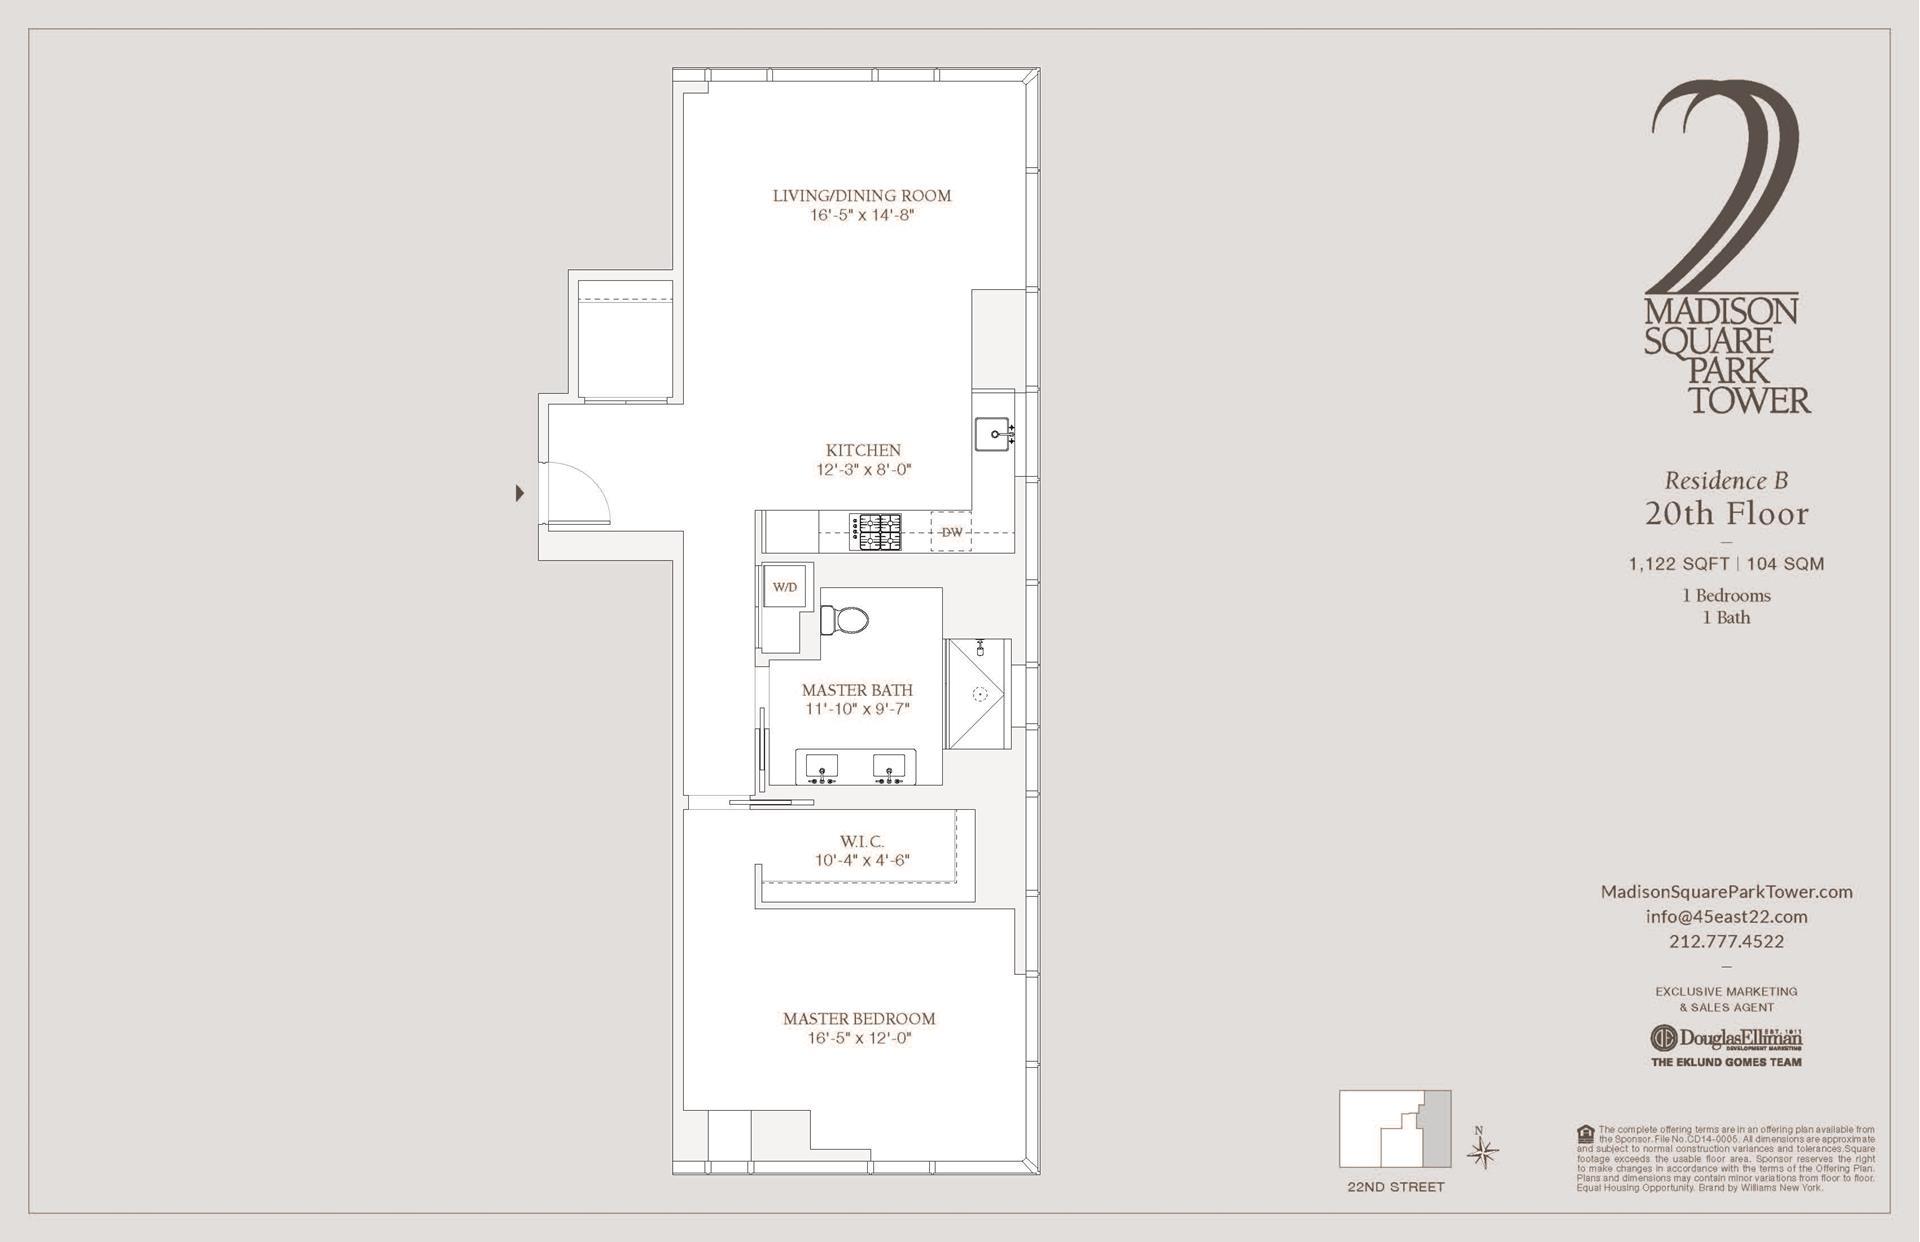 Floor plan of Madison Square Park Tower, 45 East 22nd Street, 20B - Flatiron District, New York